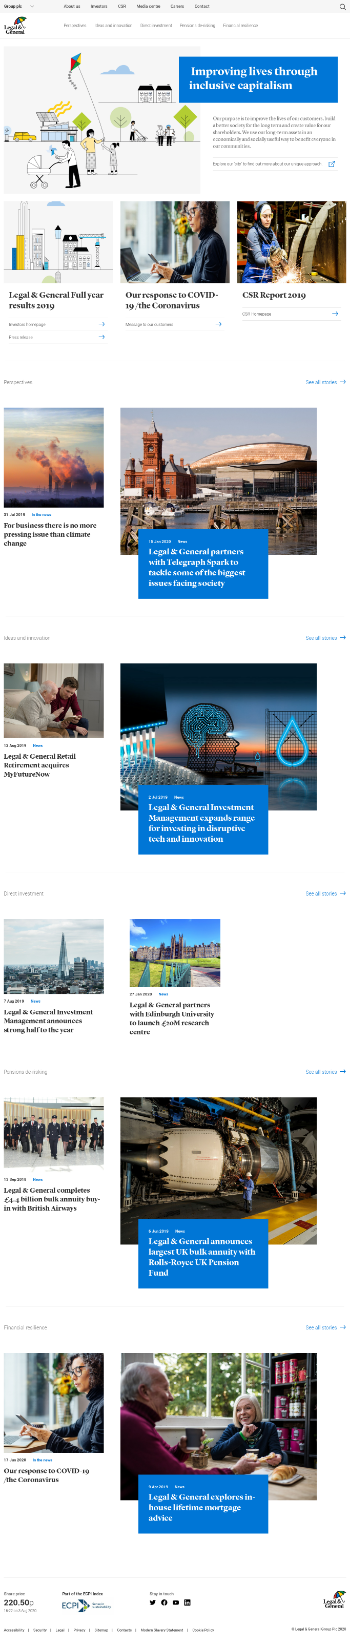 Legal & General Group Plc Website Screenshot